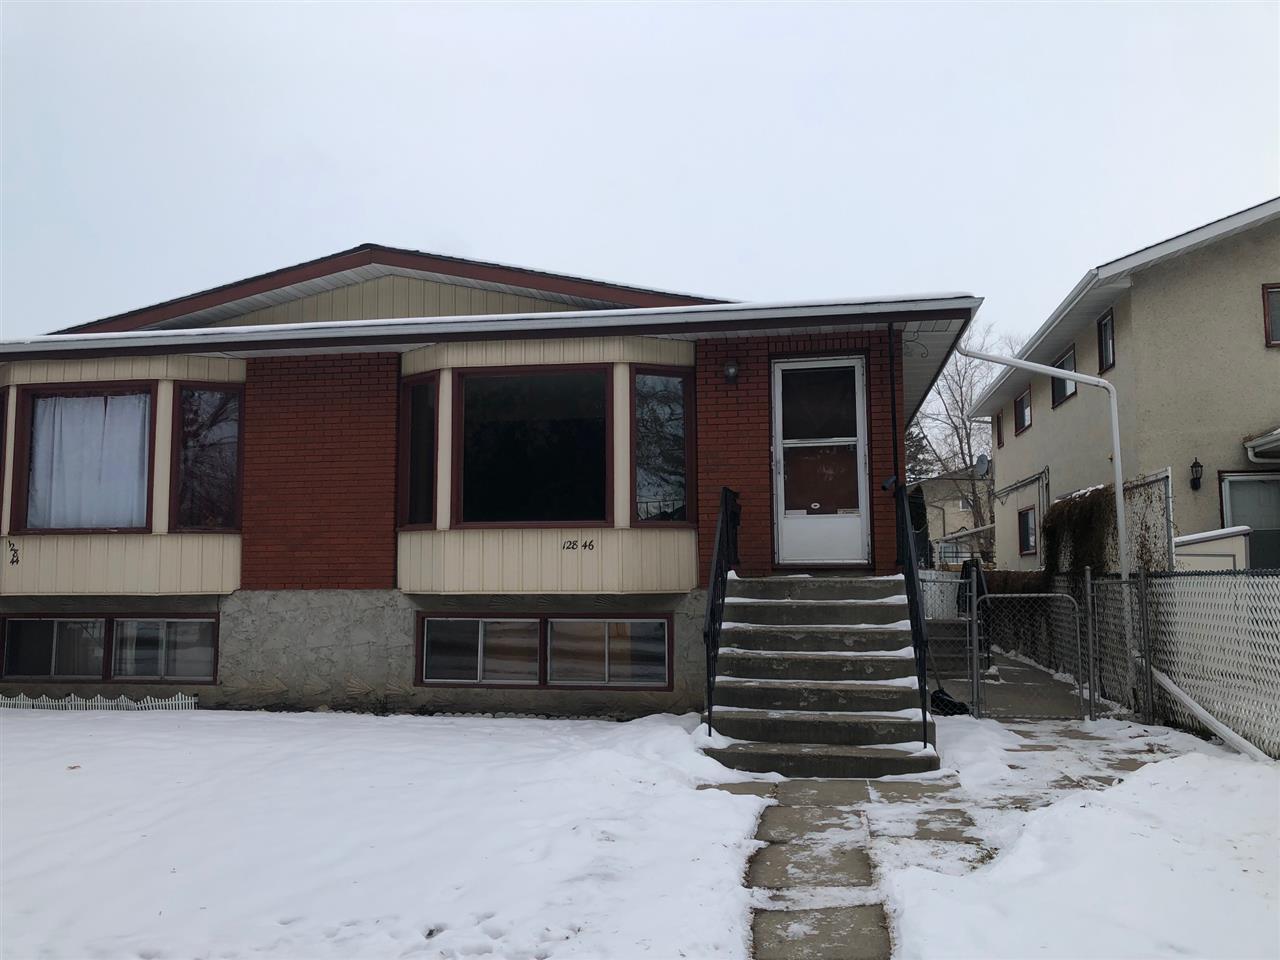 Main Photo: 12846 125 Street in Edmonton: Zone 01 House Half Duplex for sale : MLS®# E4183207